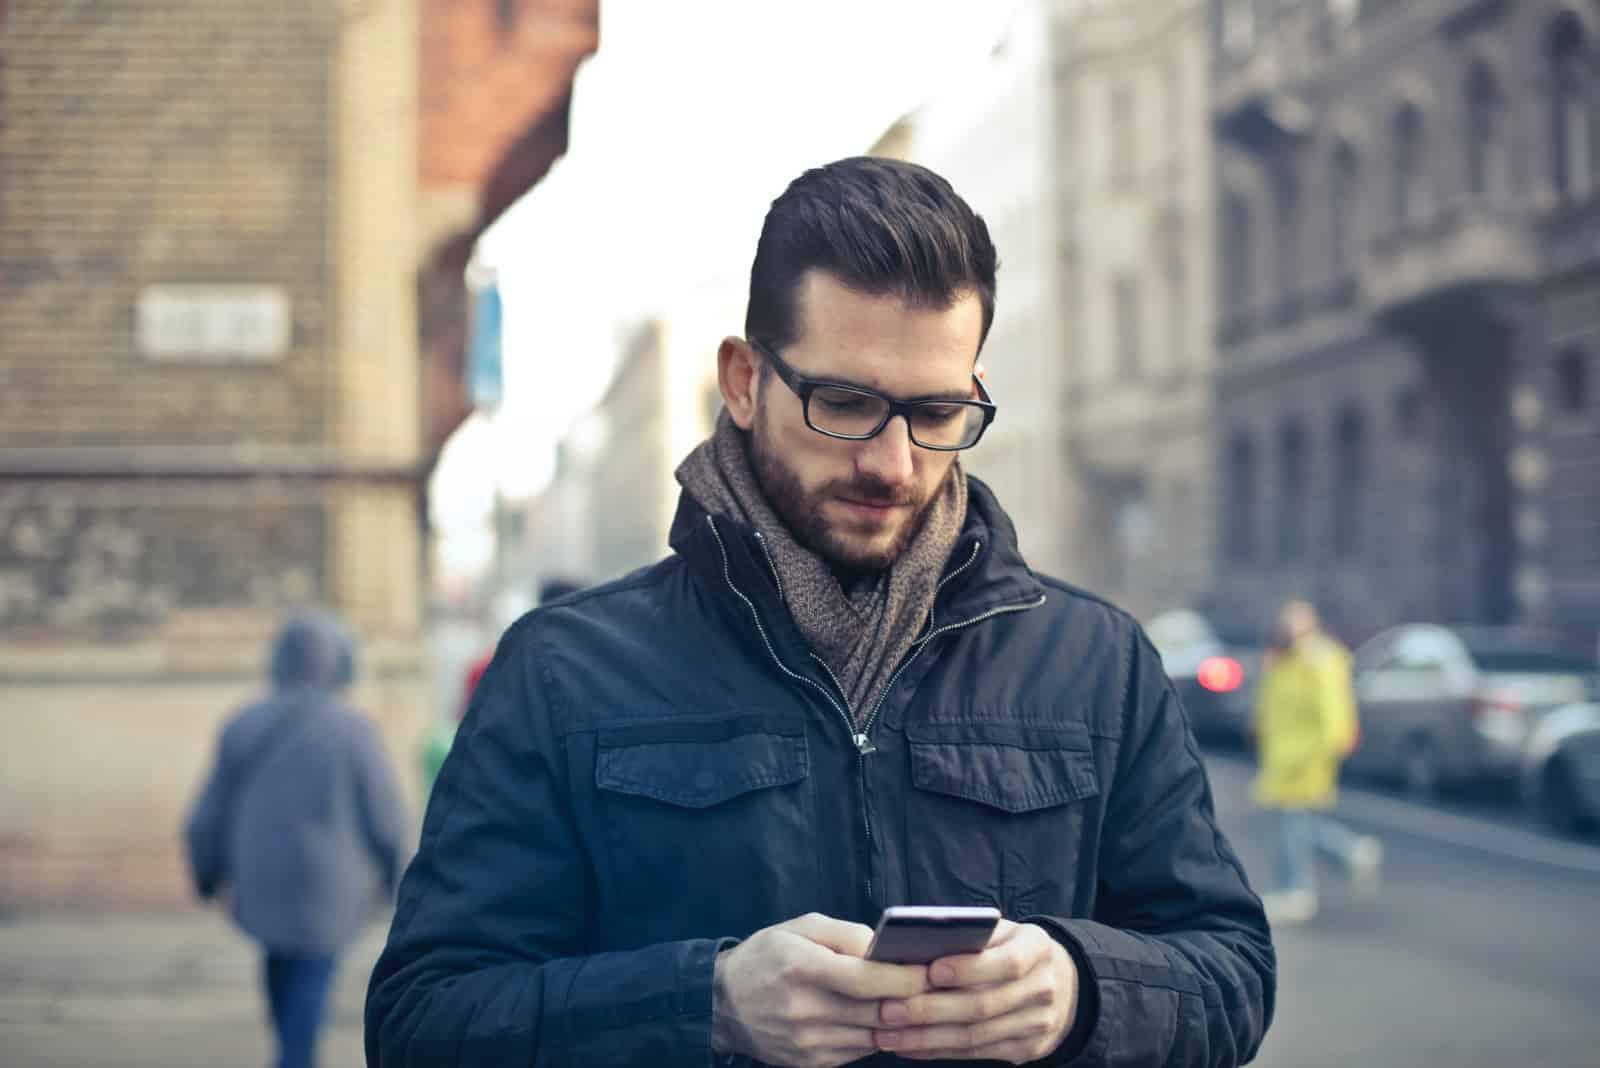 homme debout dans la rue regardant son smartphone